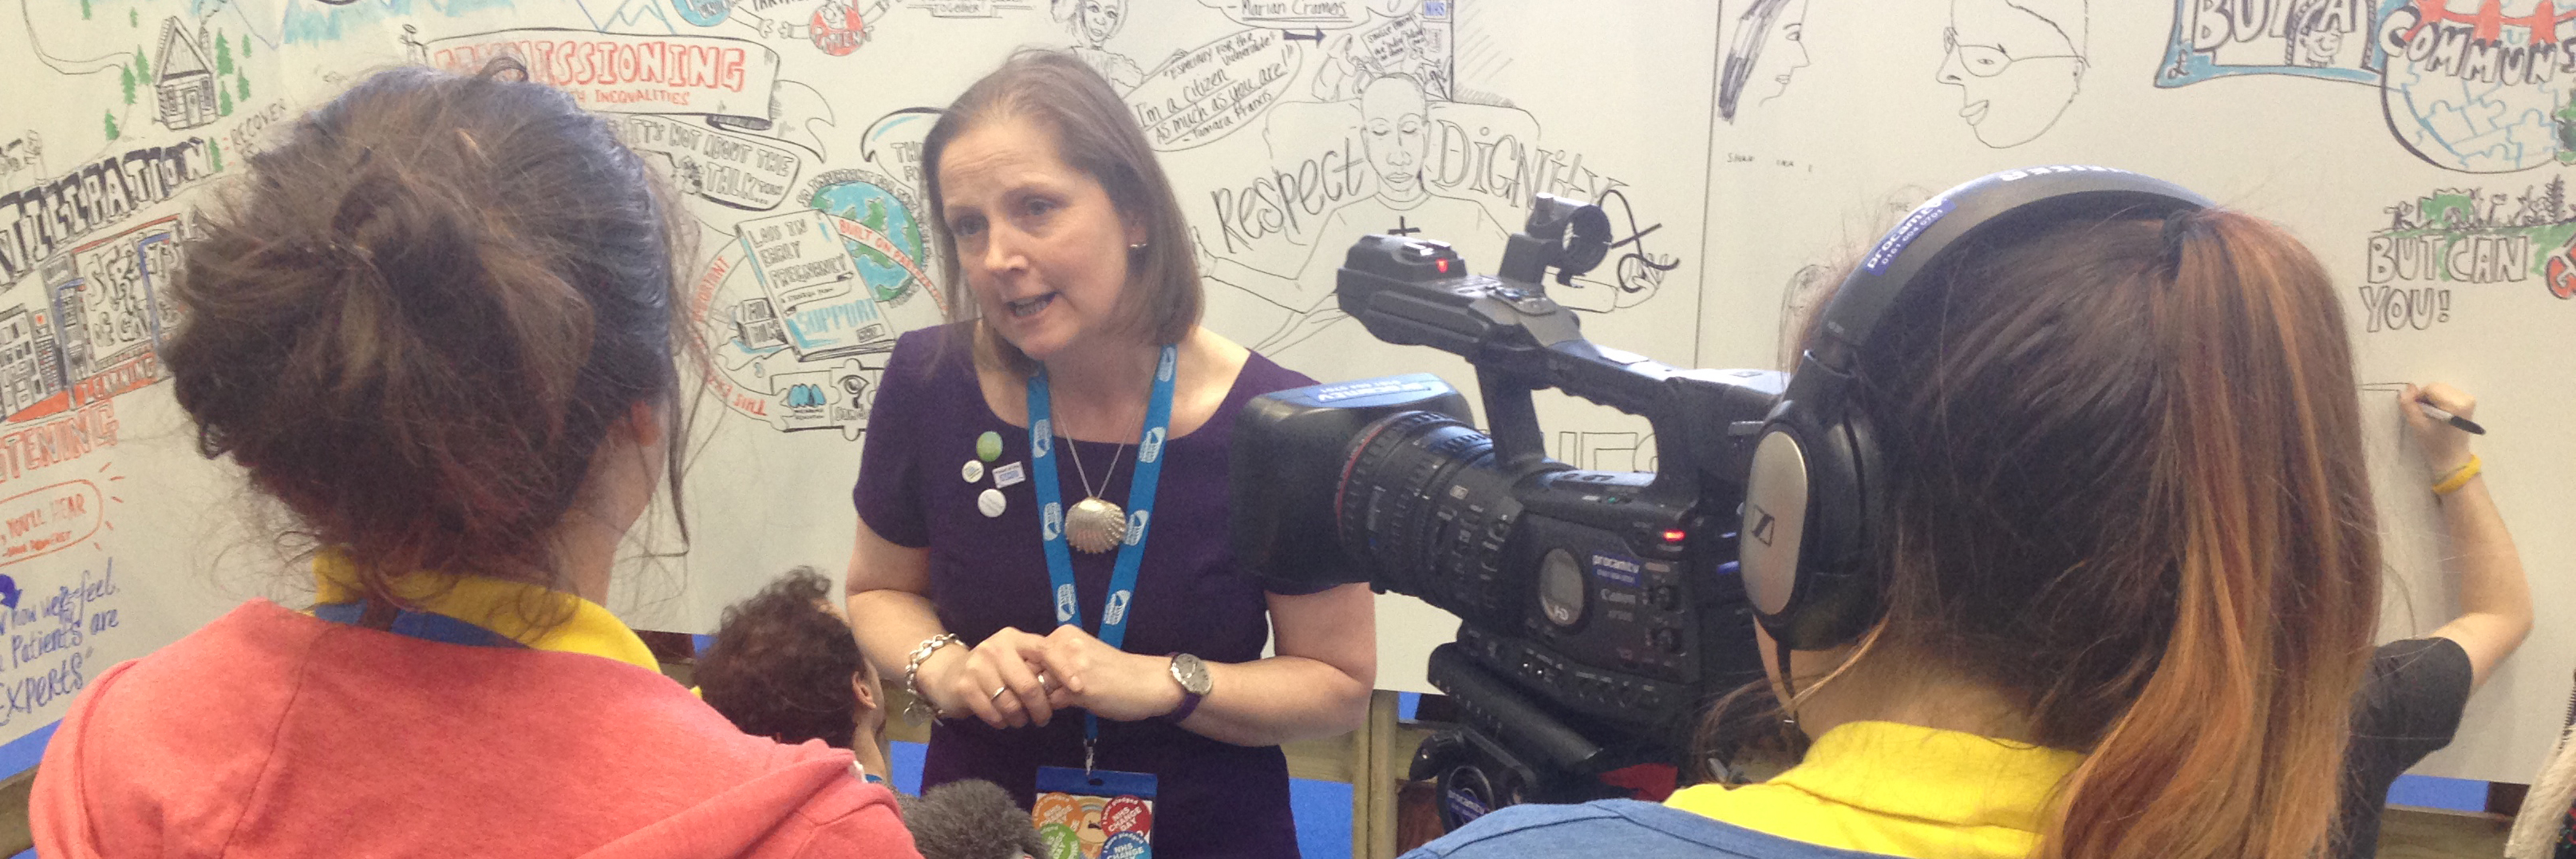 Kath Evans NHS Patient Experience